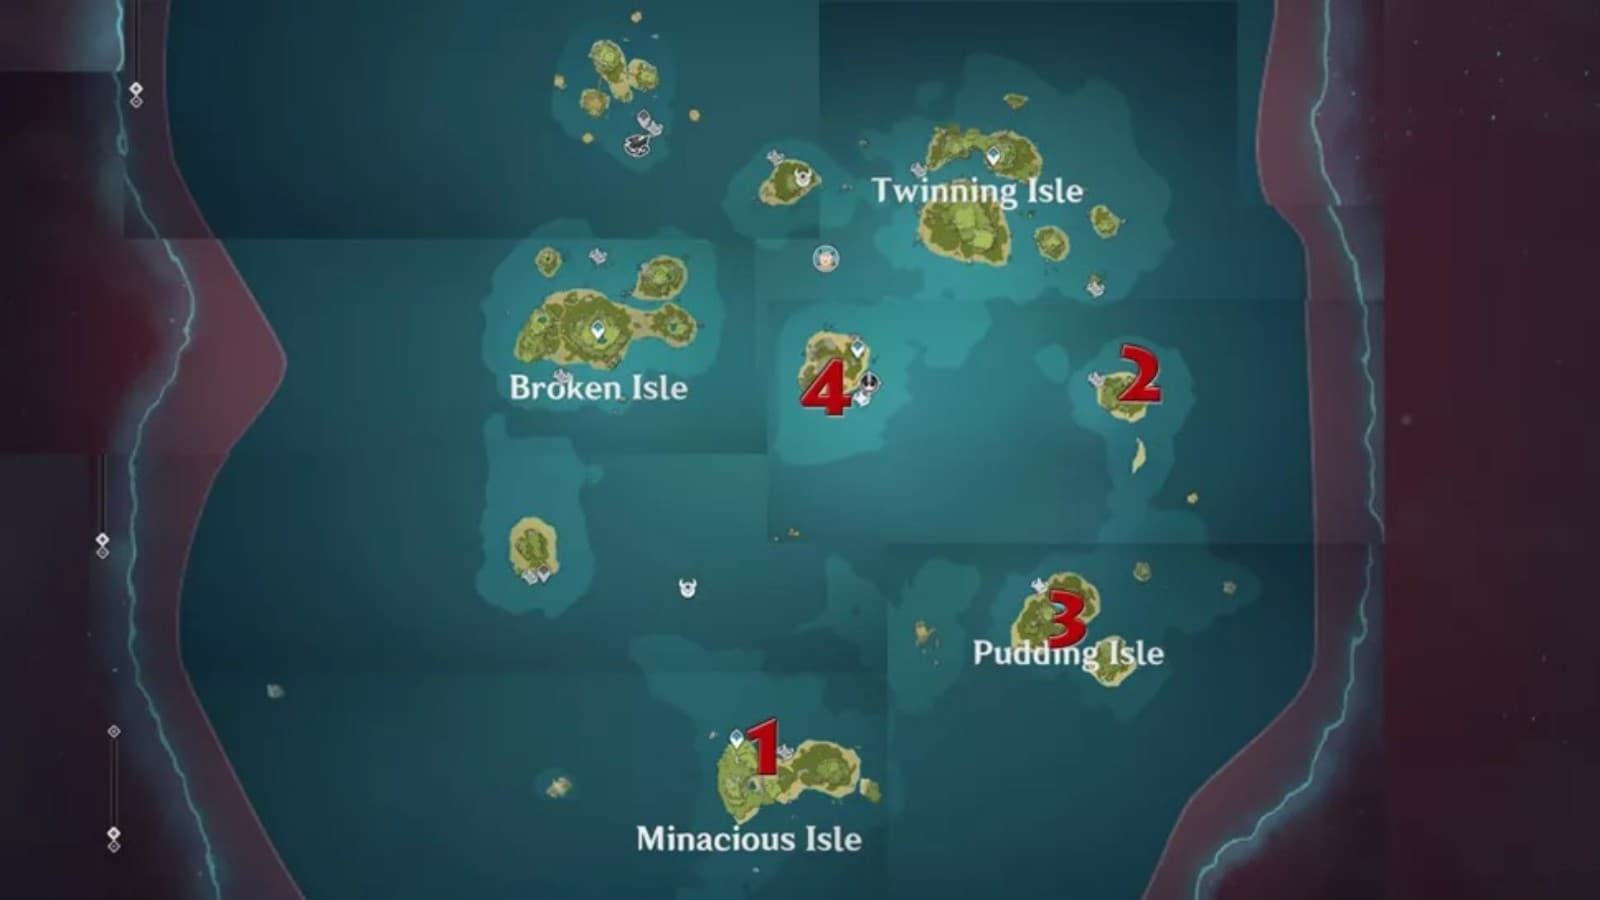 Genshin Impact Familiar Voices Conch Locations